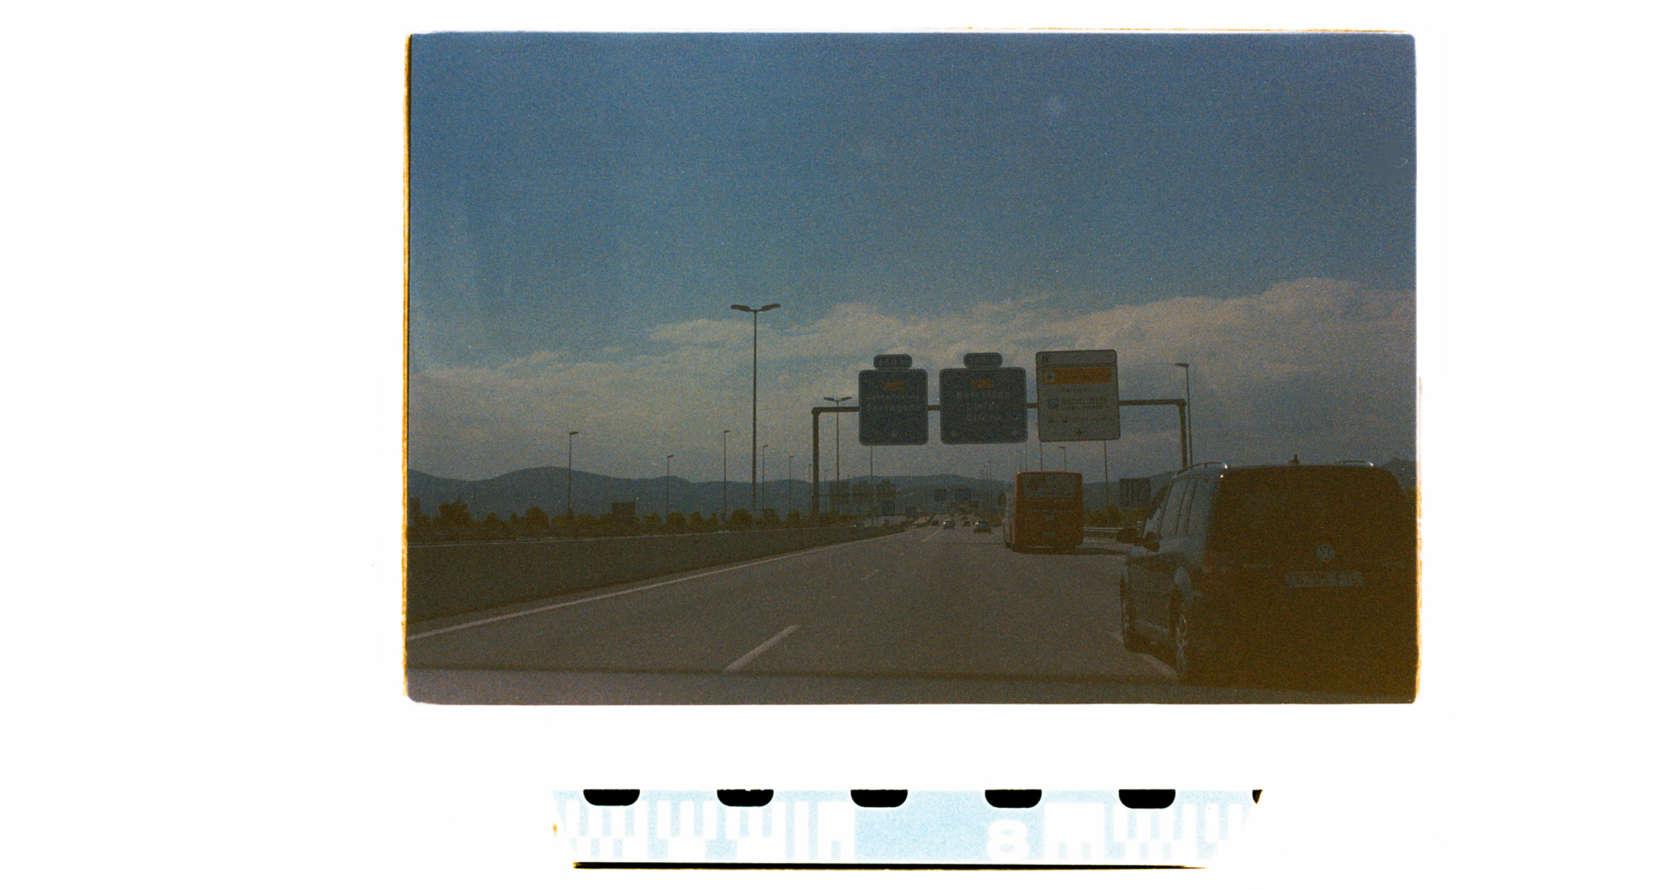 Efisio-Marras-013-1-1660x889.jpg